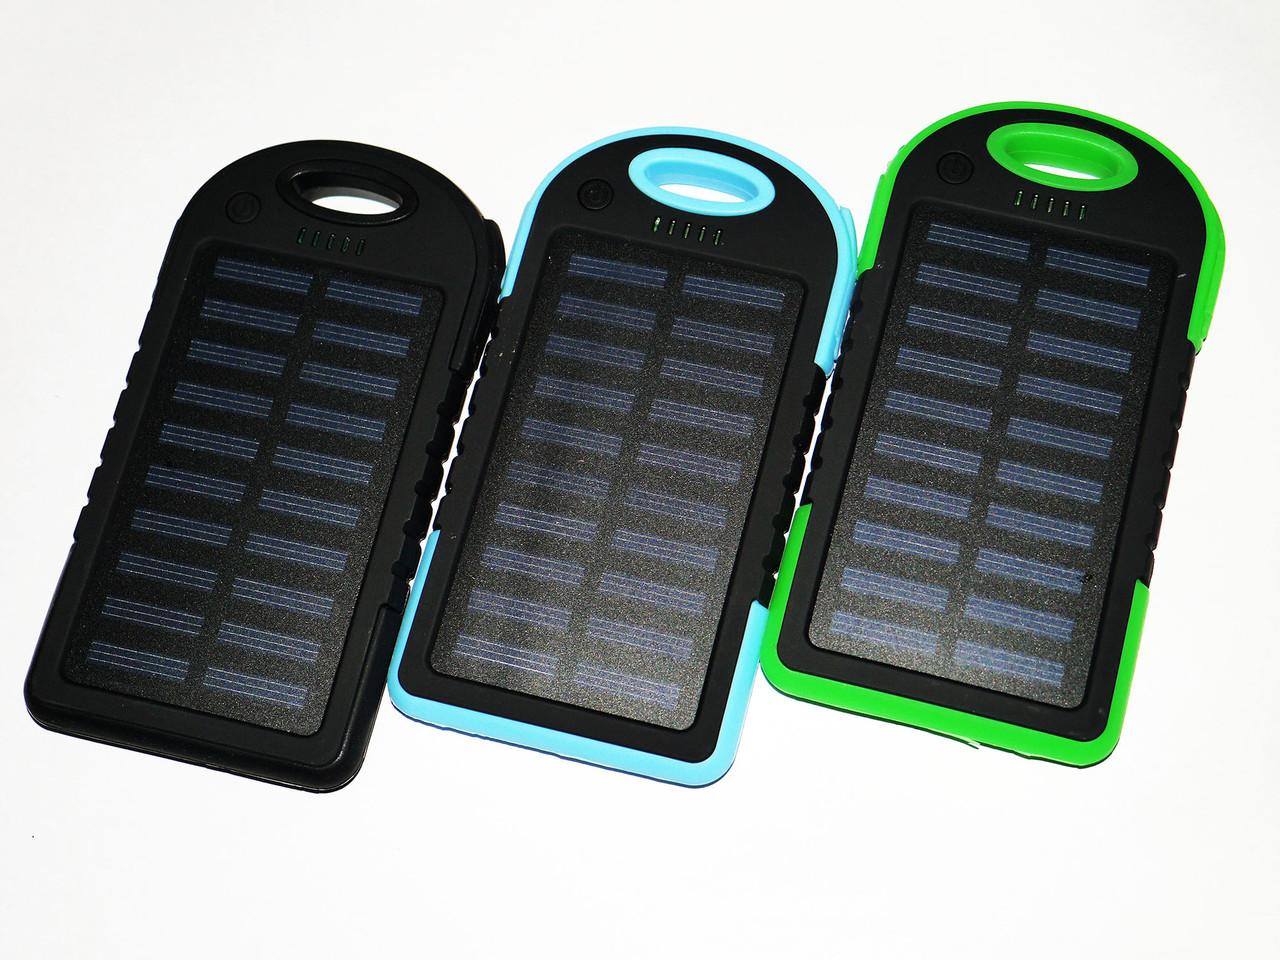 Power Bank UKC 10800mah 2 в 1 Solar+Led  Портативное зарядное устройство